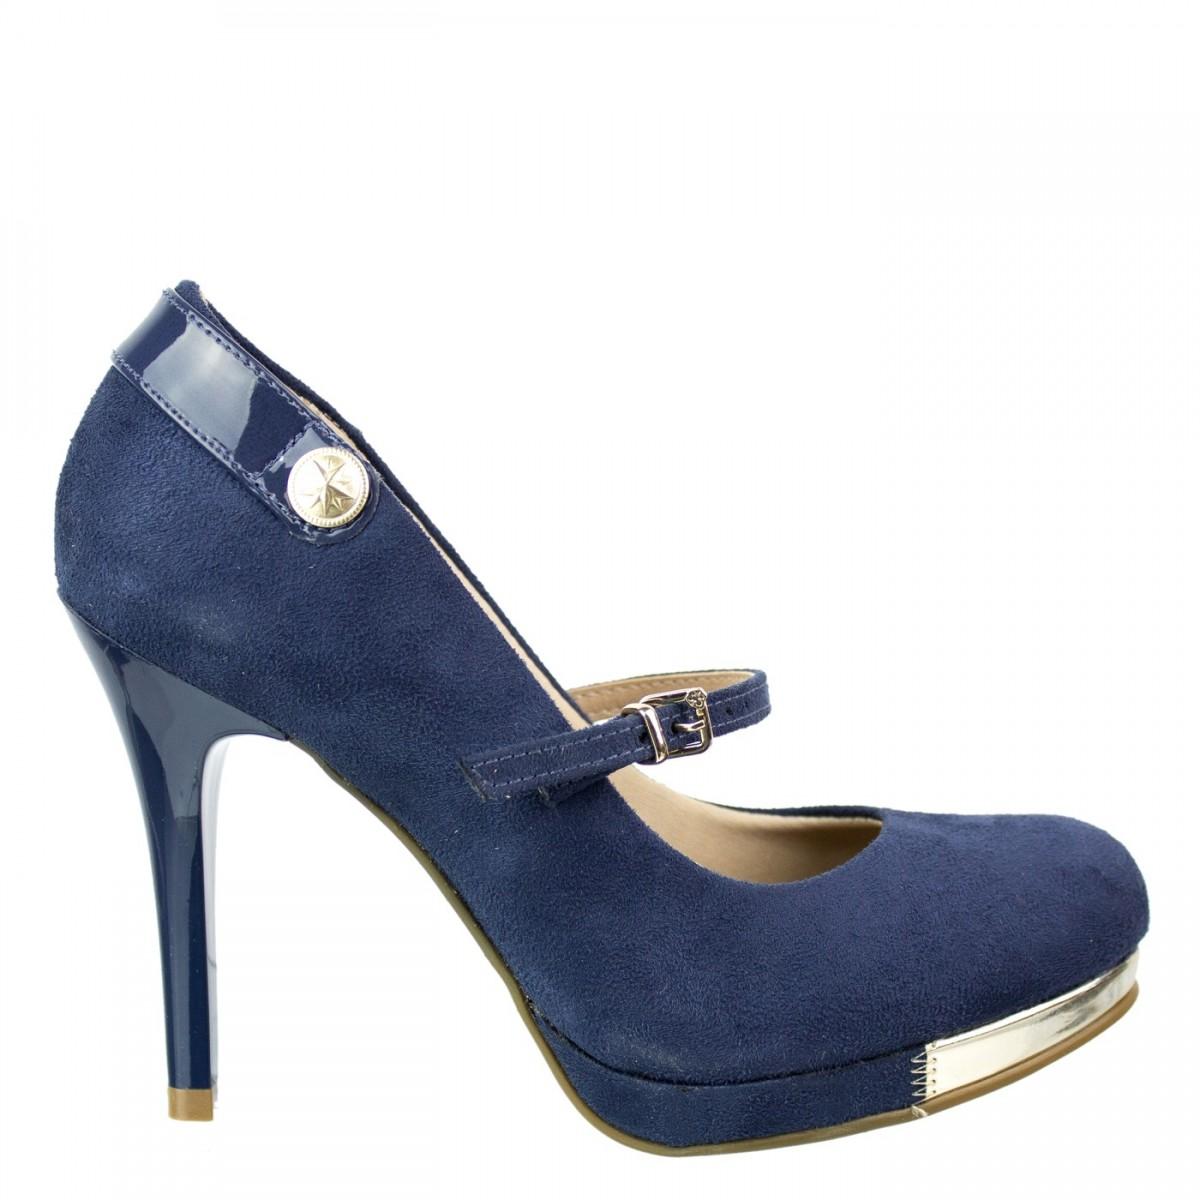 Sapato Camurça Bebecê 8082-109 - Azul  1d778899c7b03